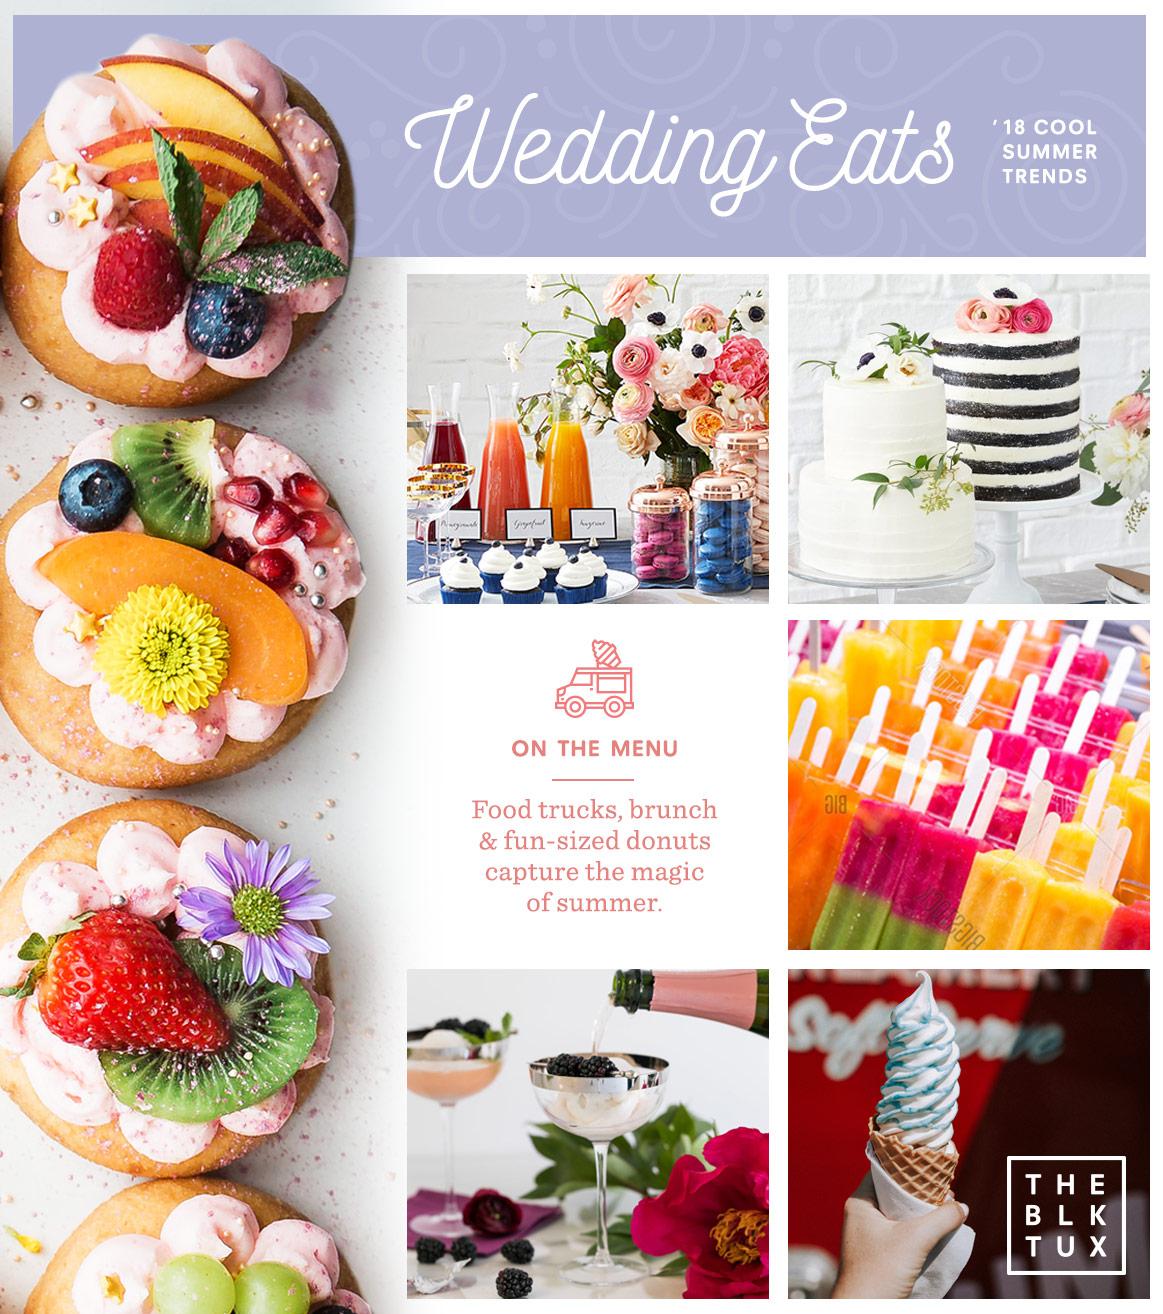 Blacktrux_weddingtrends_eats_v01.jpg